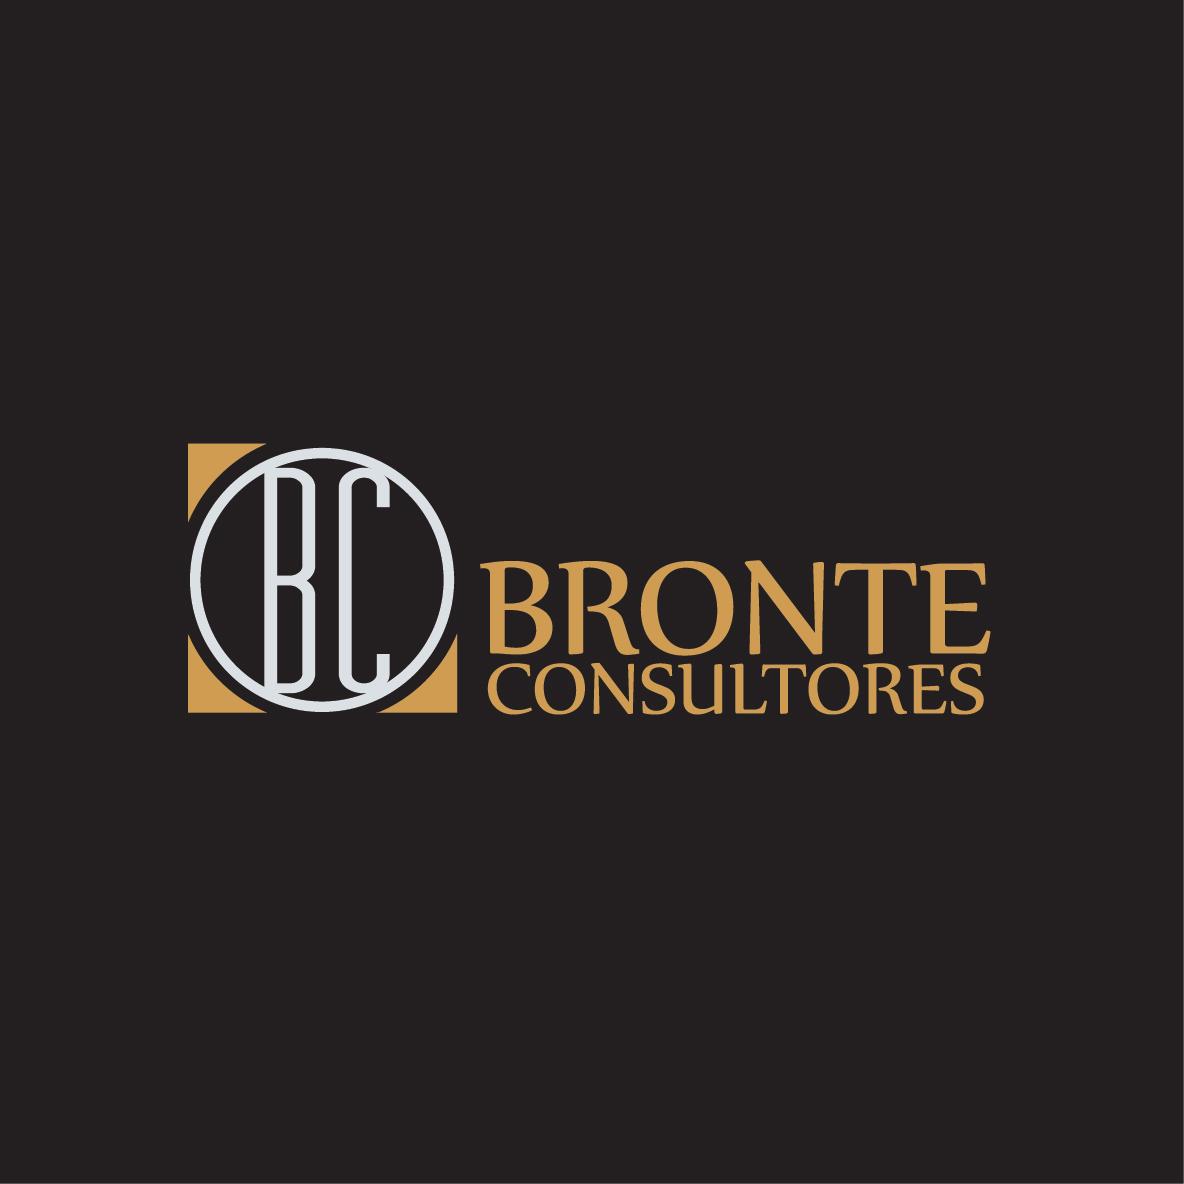 Bronte Consultores